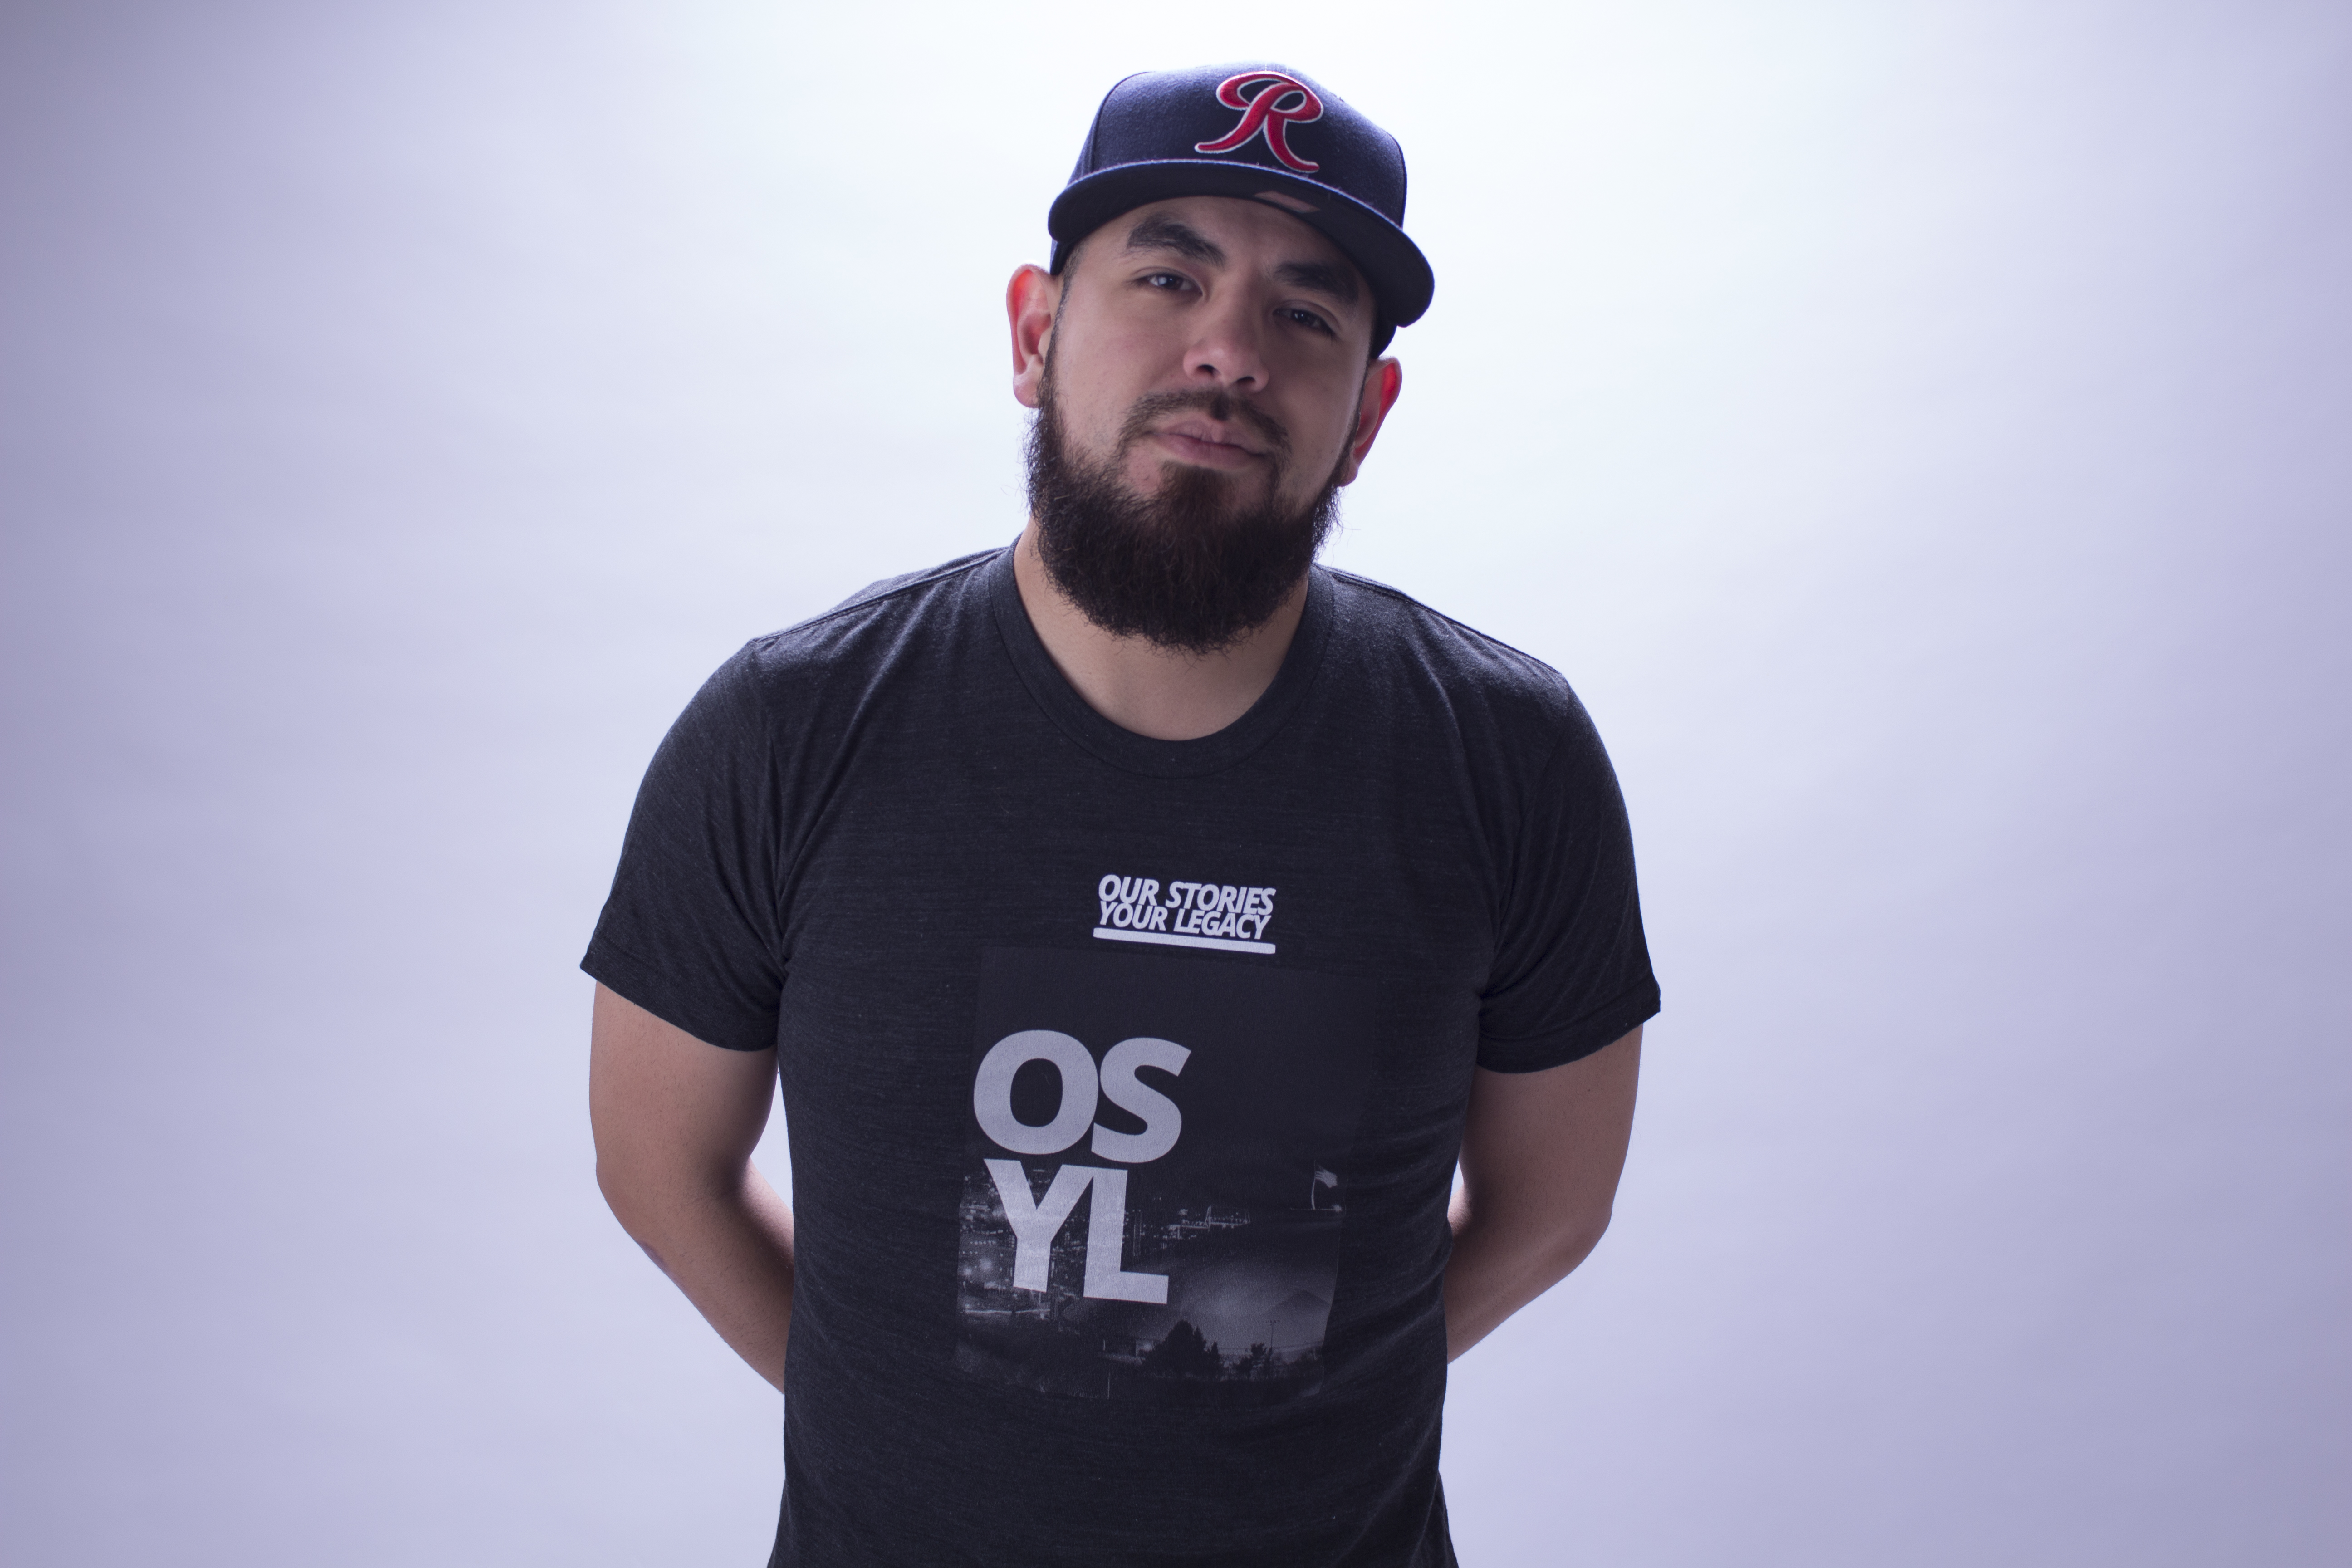 OSYL Shirt